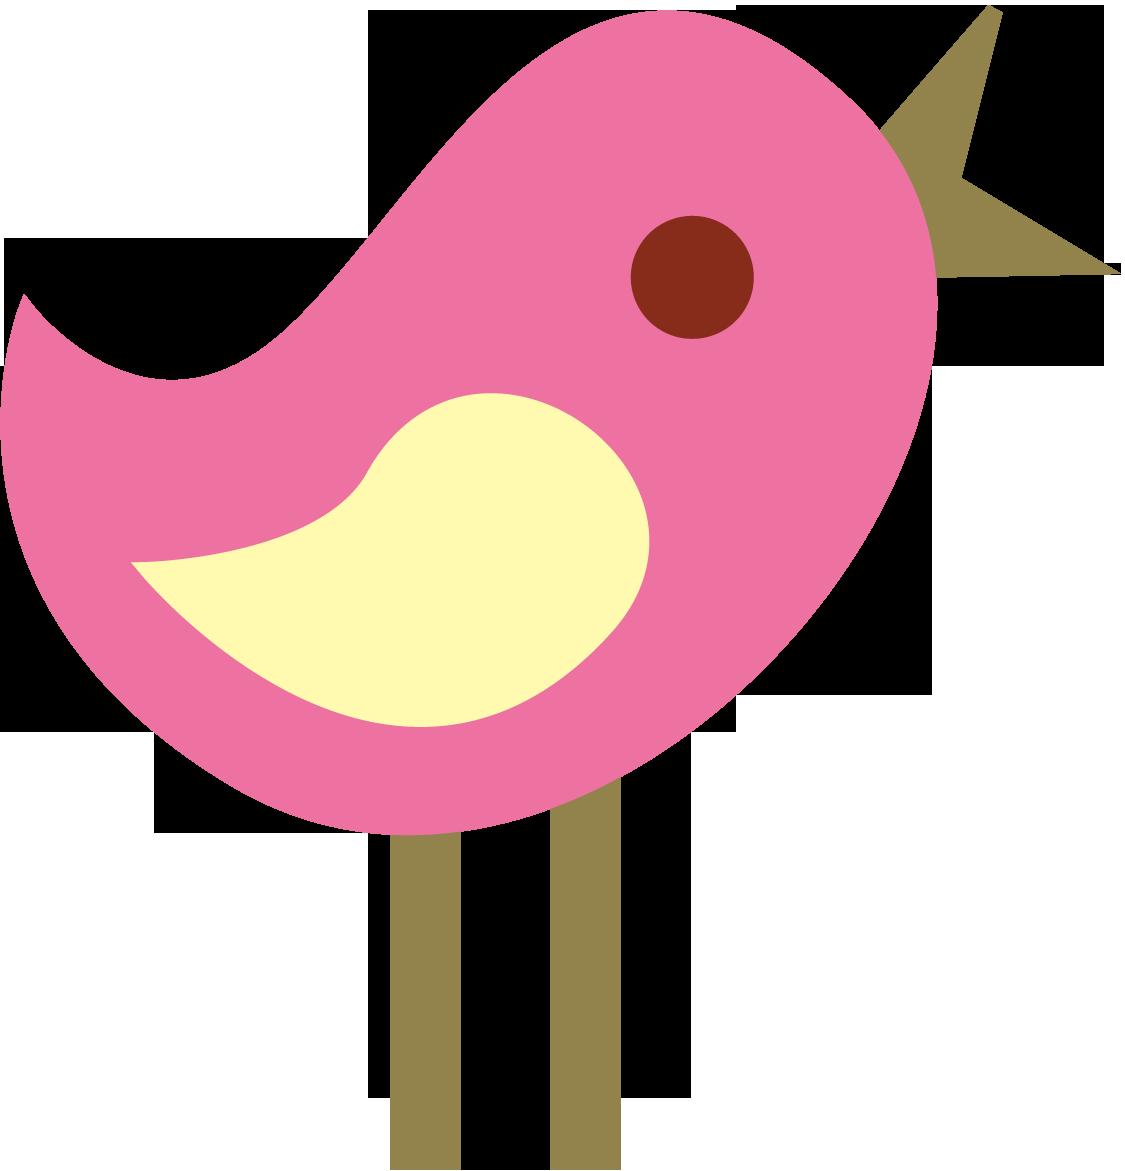 Cute Girly Bird Clipart - Cute Bird Clipart